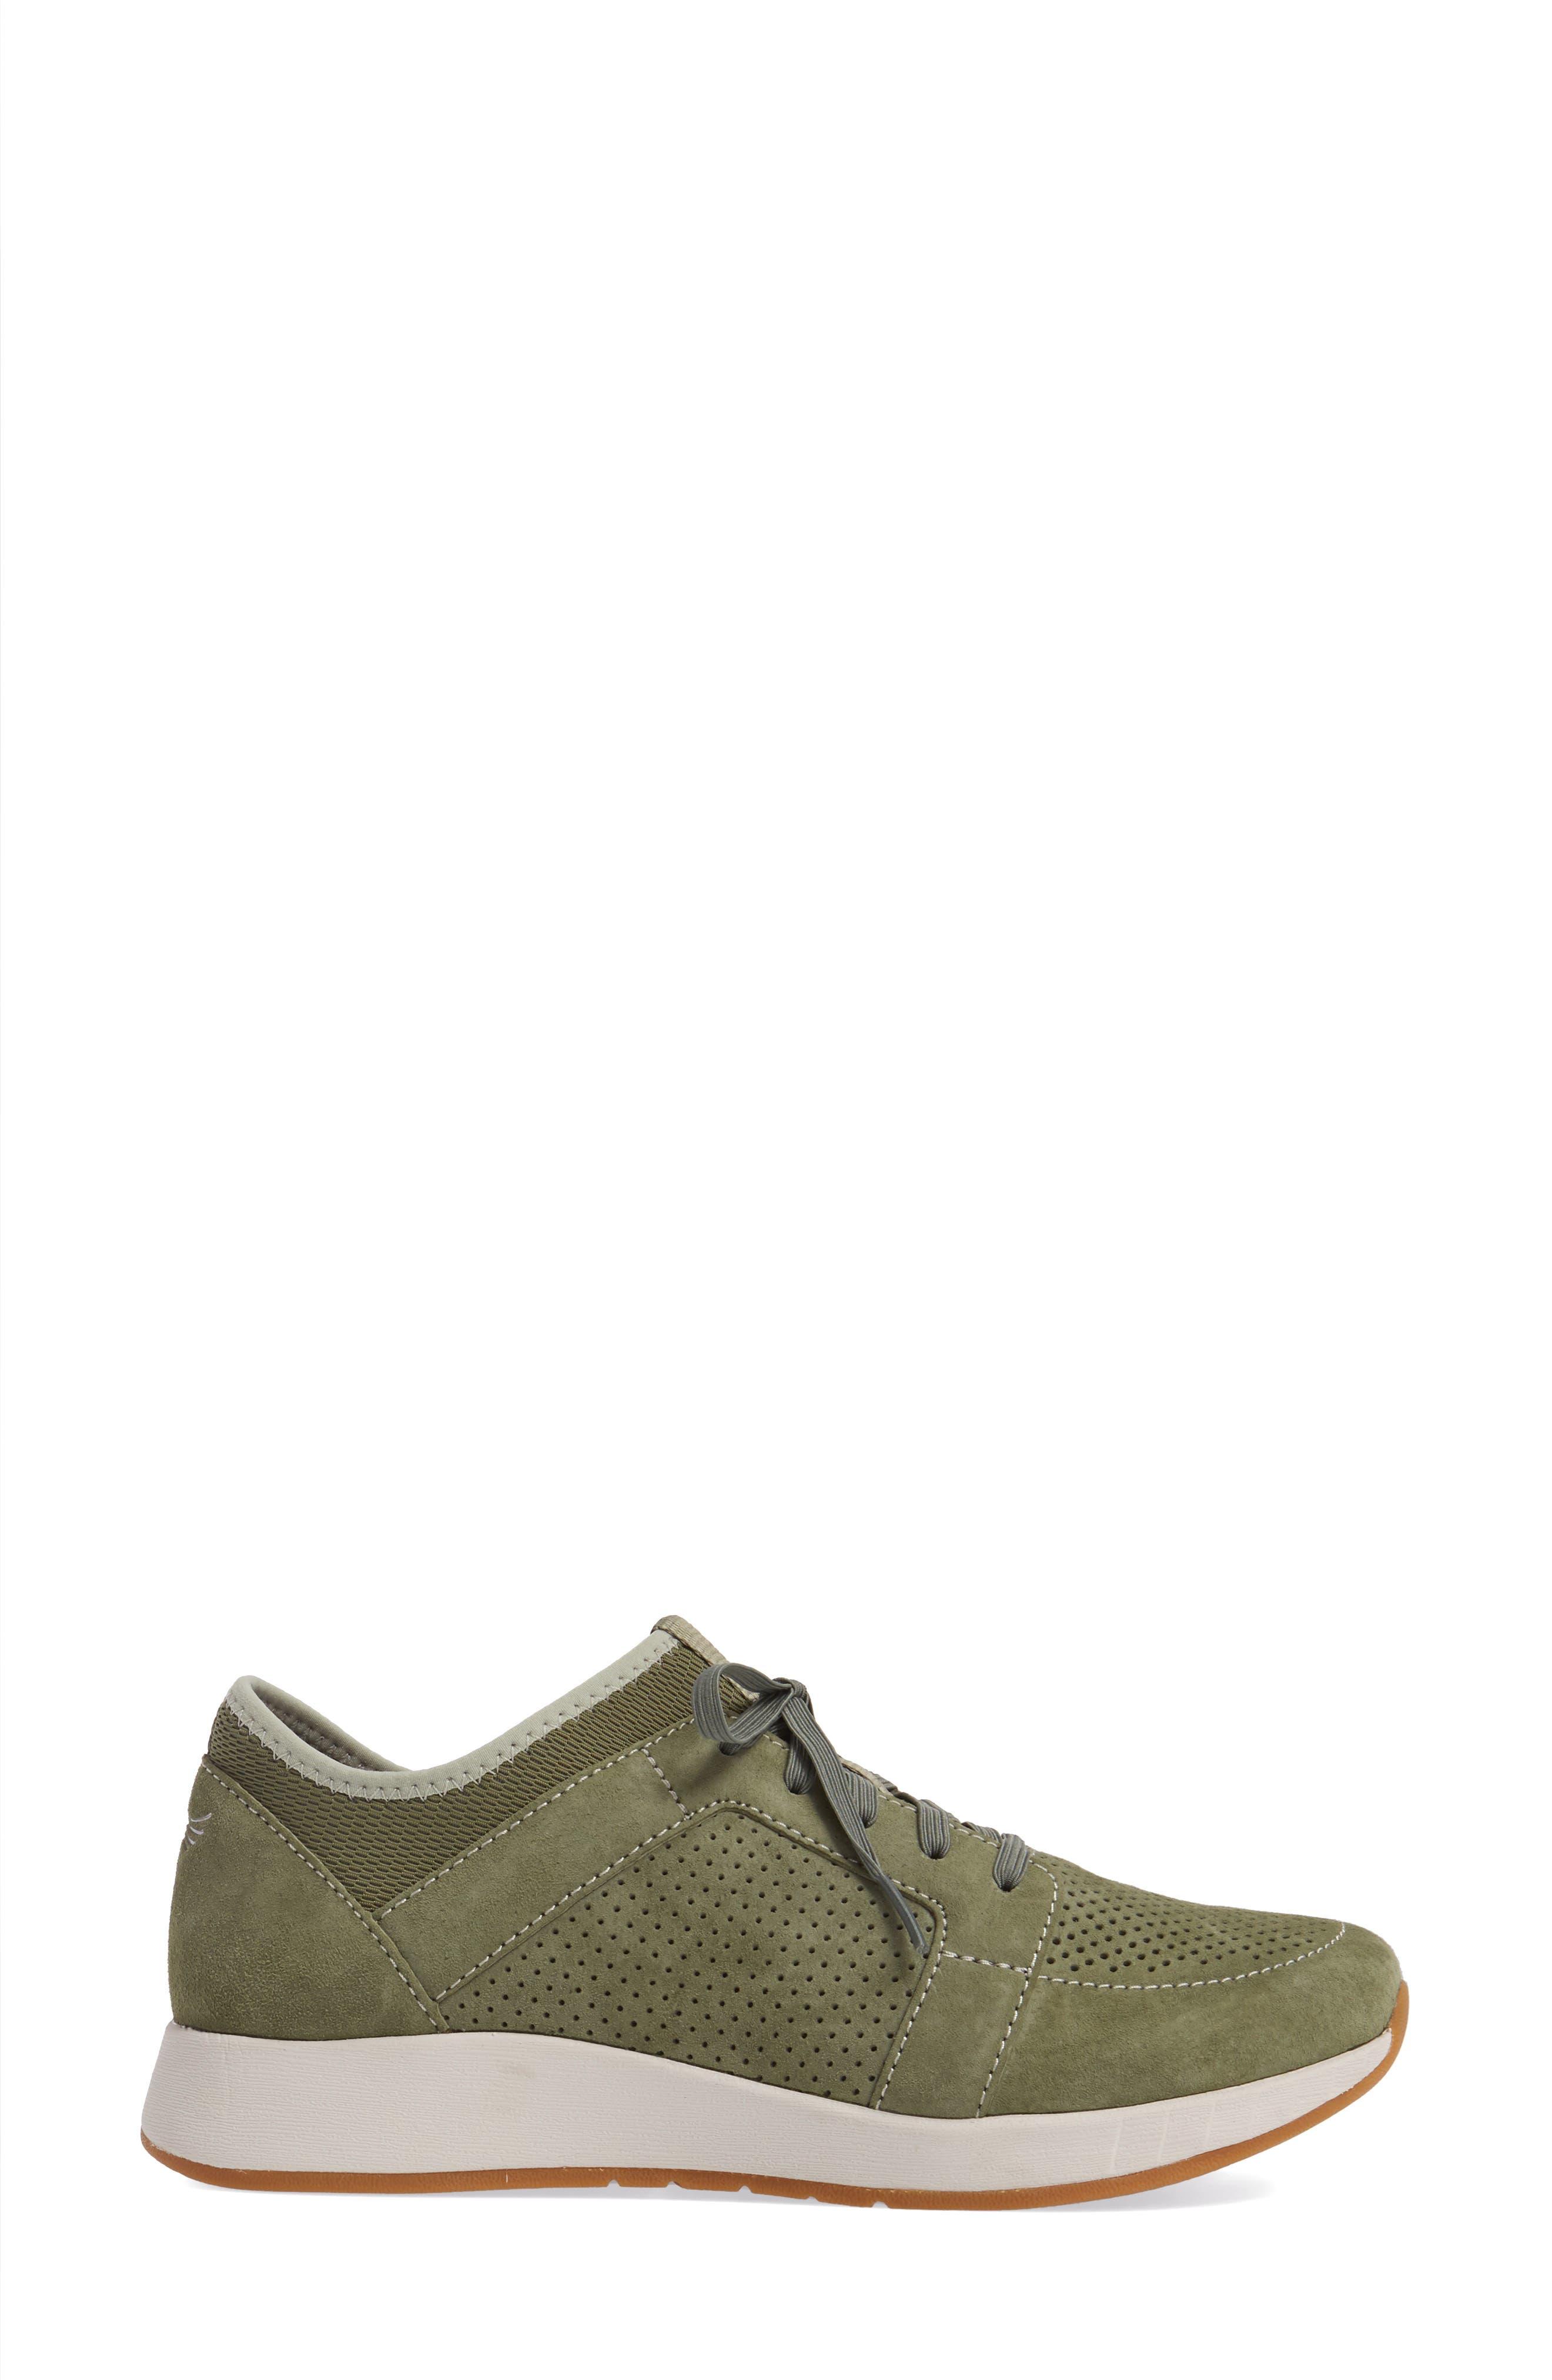 Cozette Slip-On Sneaker,                             Alternate thumbnail 3, color,                             Sage Suede